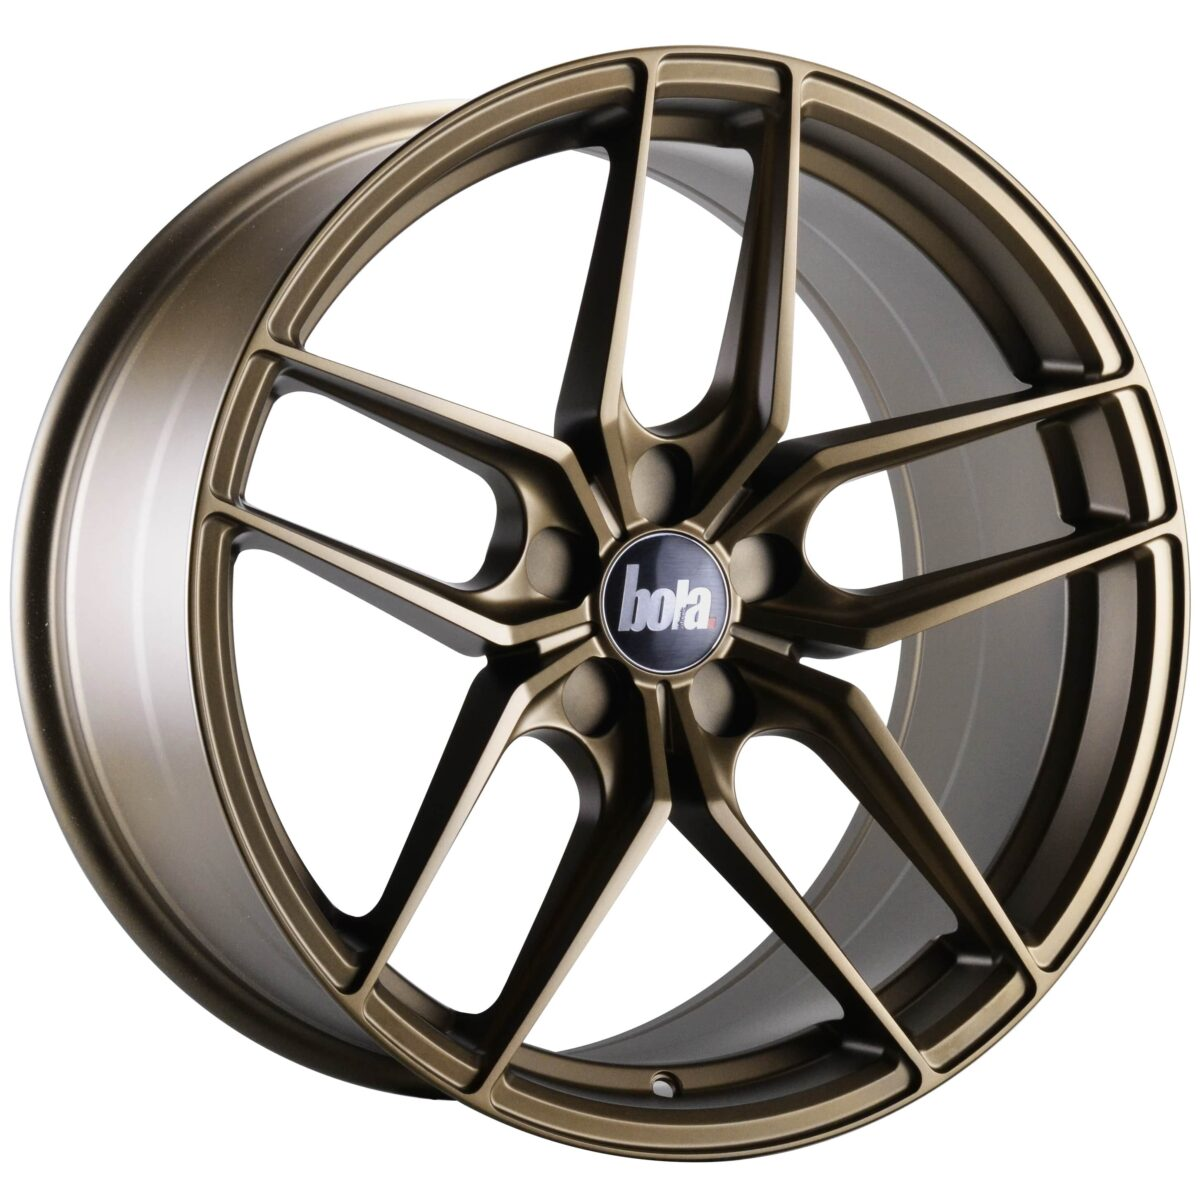 "18"" BOLA B11 Wheels - Matt Bronze - VW / Audi / Mercedes - 5x112"